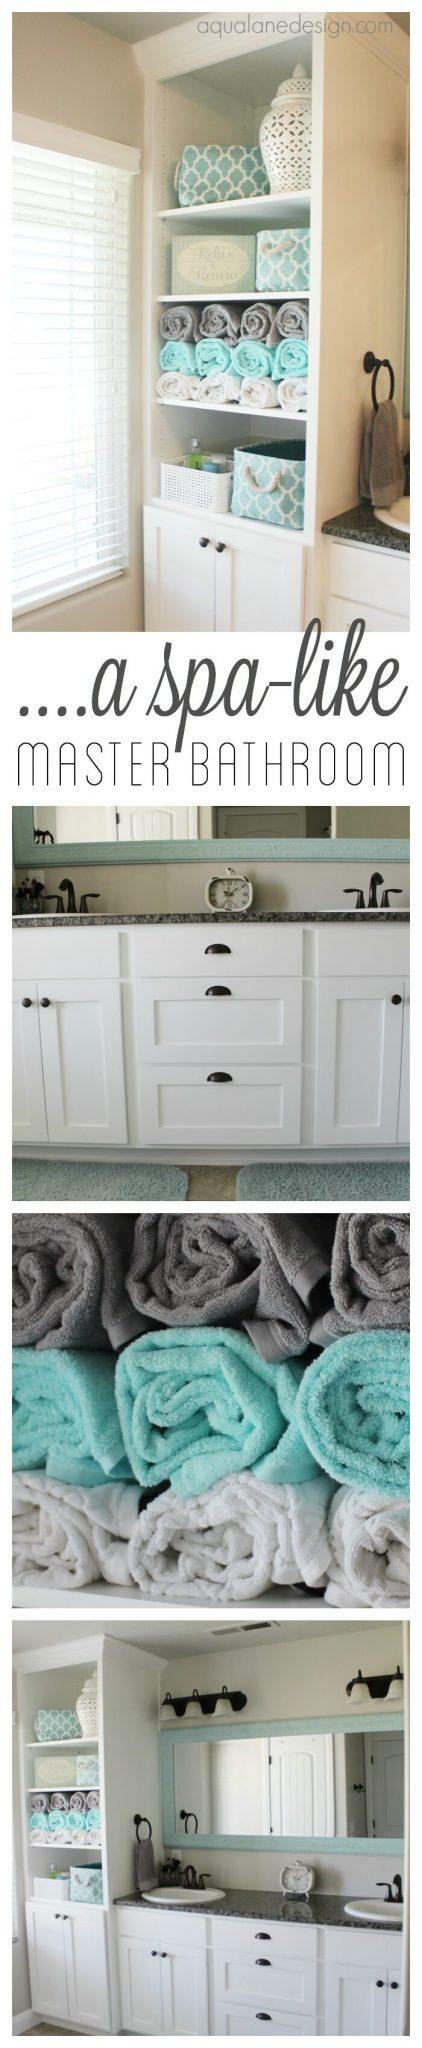 Bathroom Storage Ideas -The Spa Treatment - harpmagazine.com